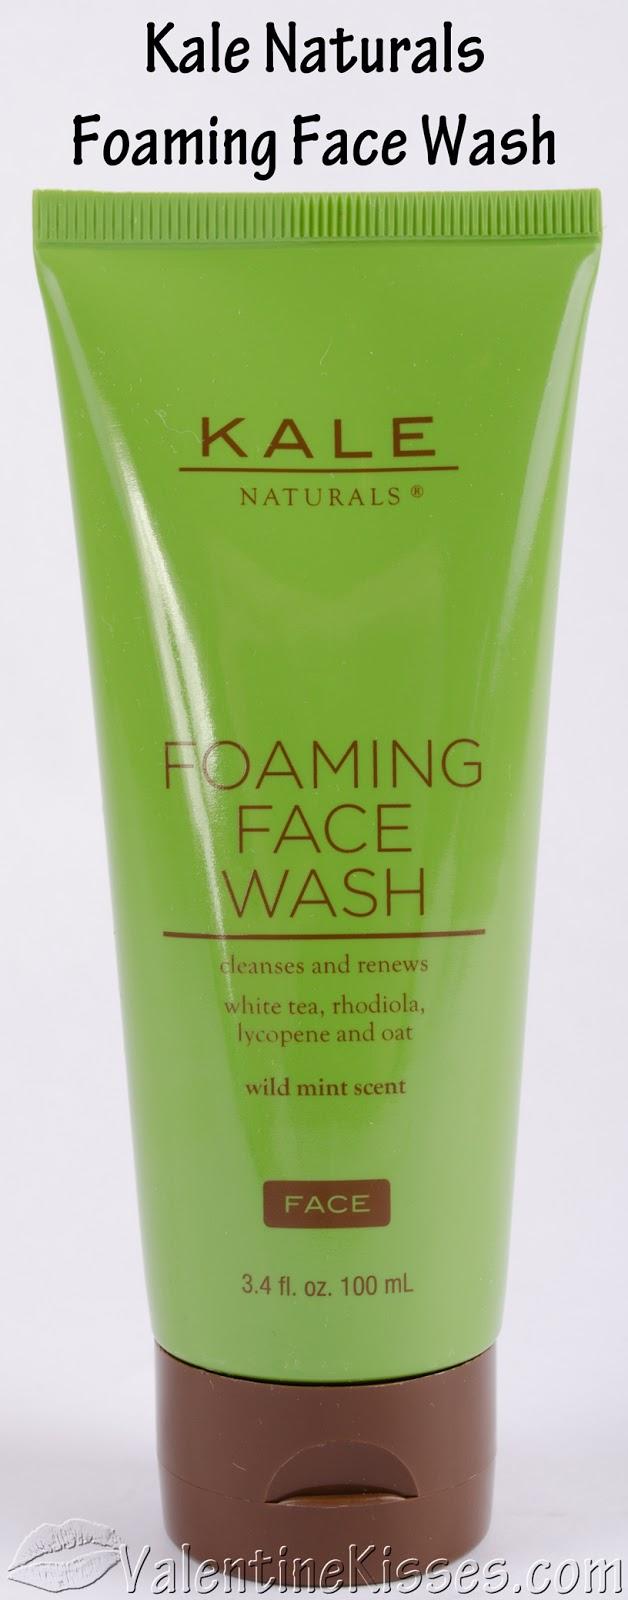 Kale Naturals Face Wash